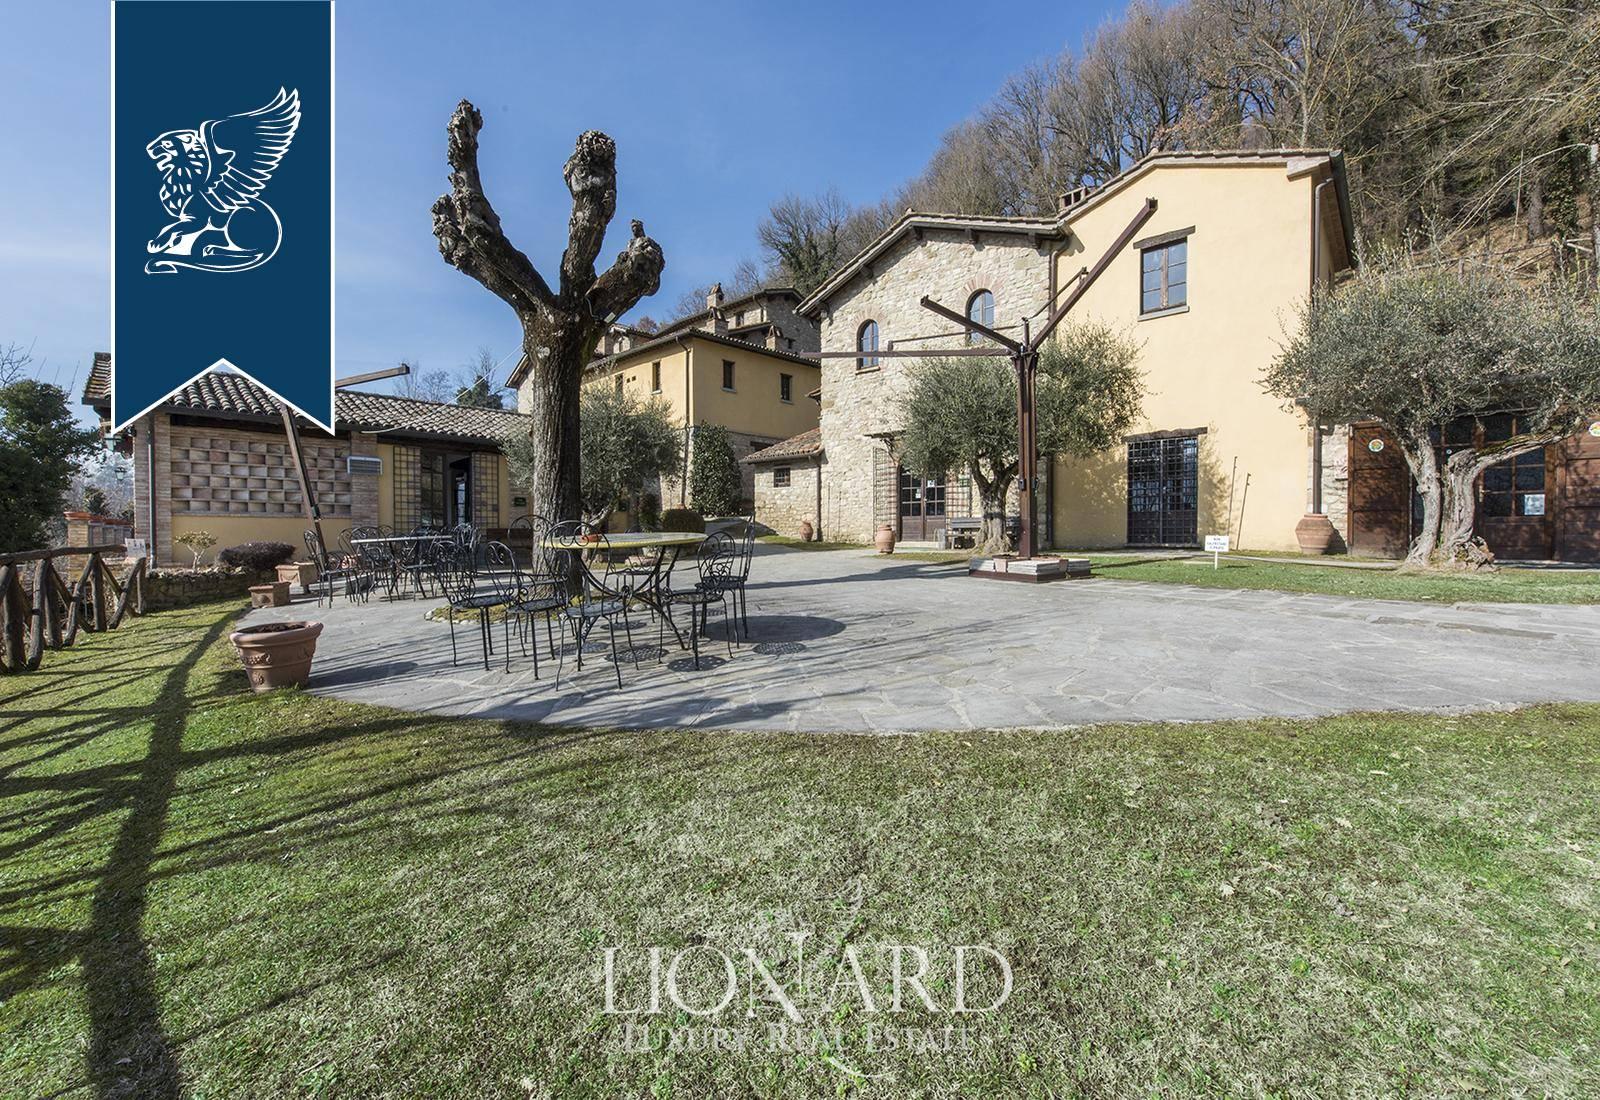 Agriturismo in Vendita a Citta' Di Castello: 0 locali, 1500 mq - Foto 9